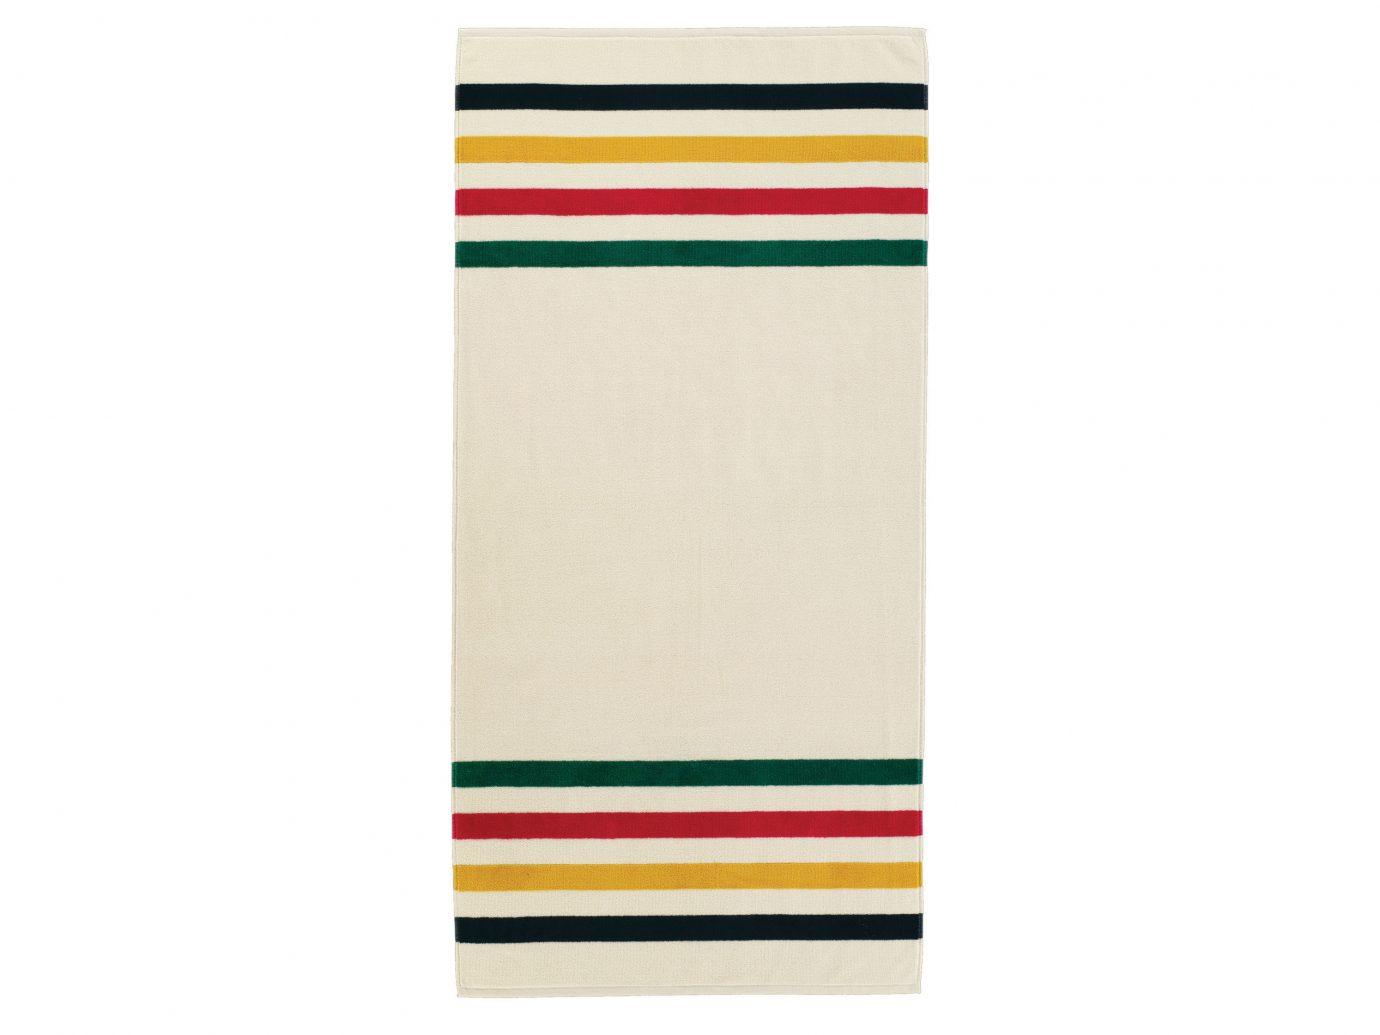 Style + Design textile material kitchen towel line linens rectangle